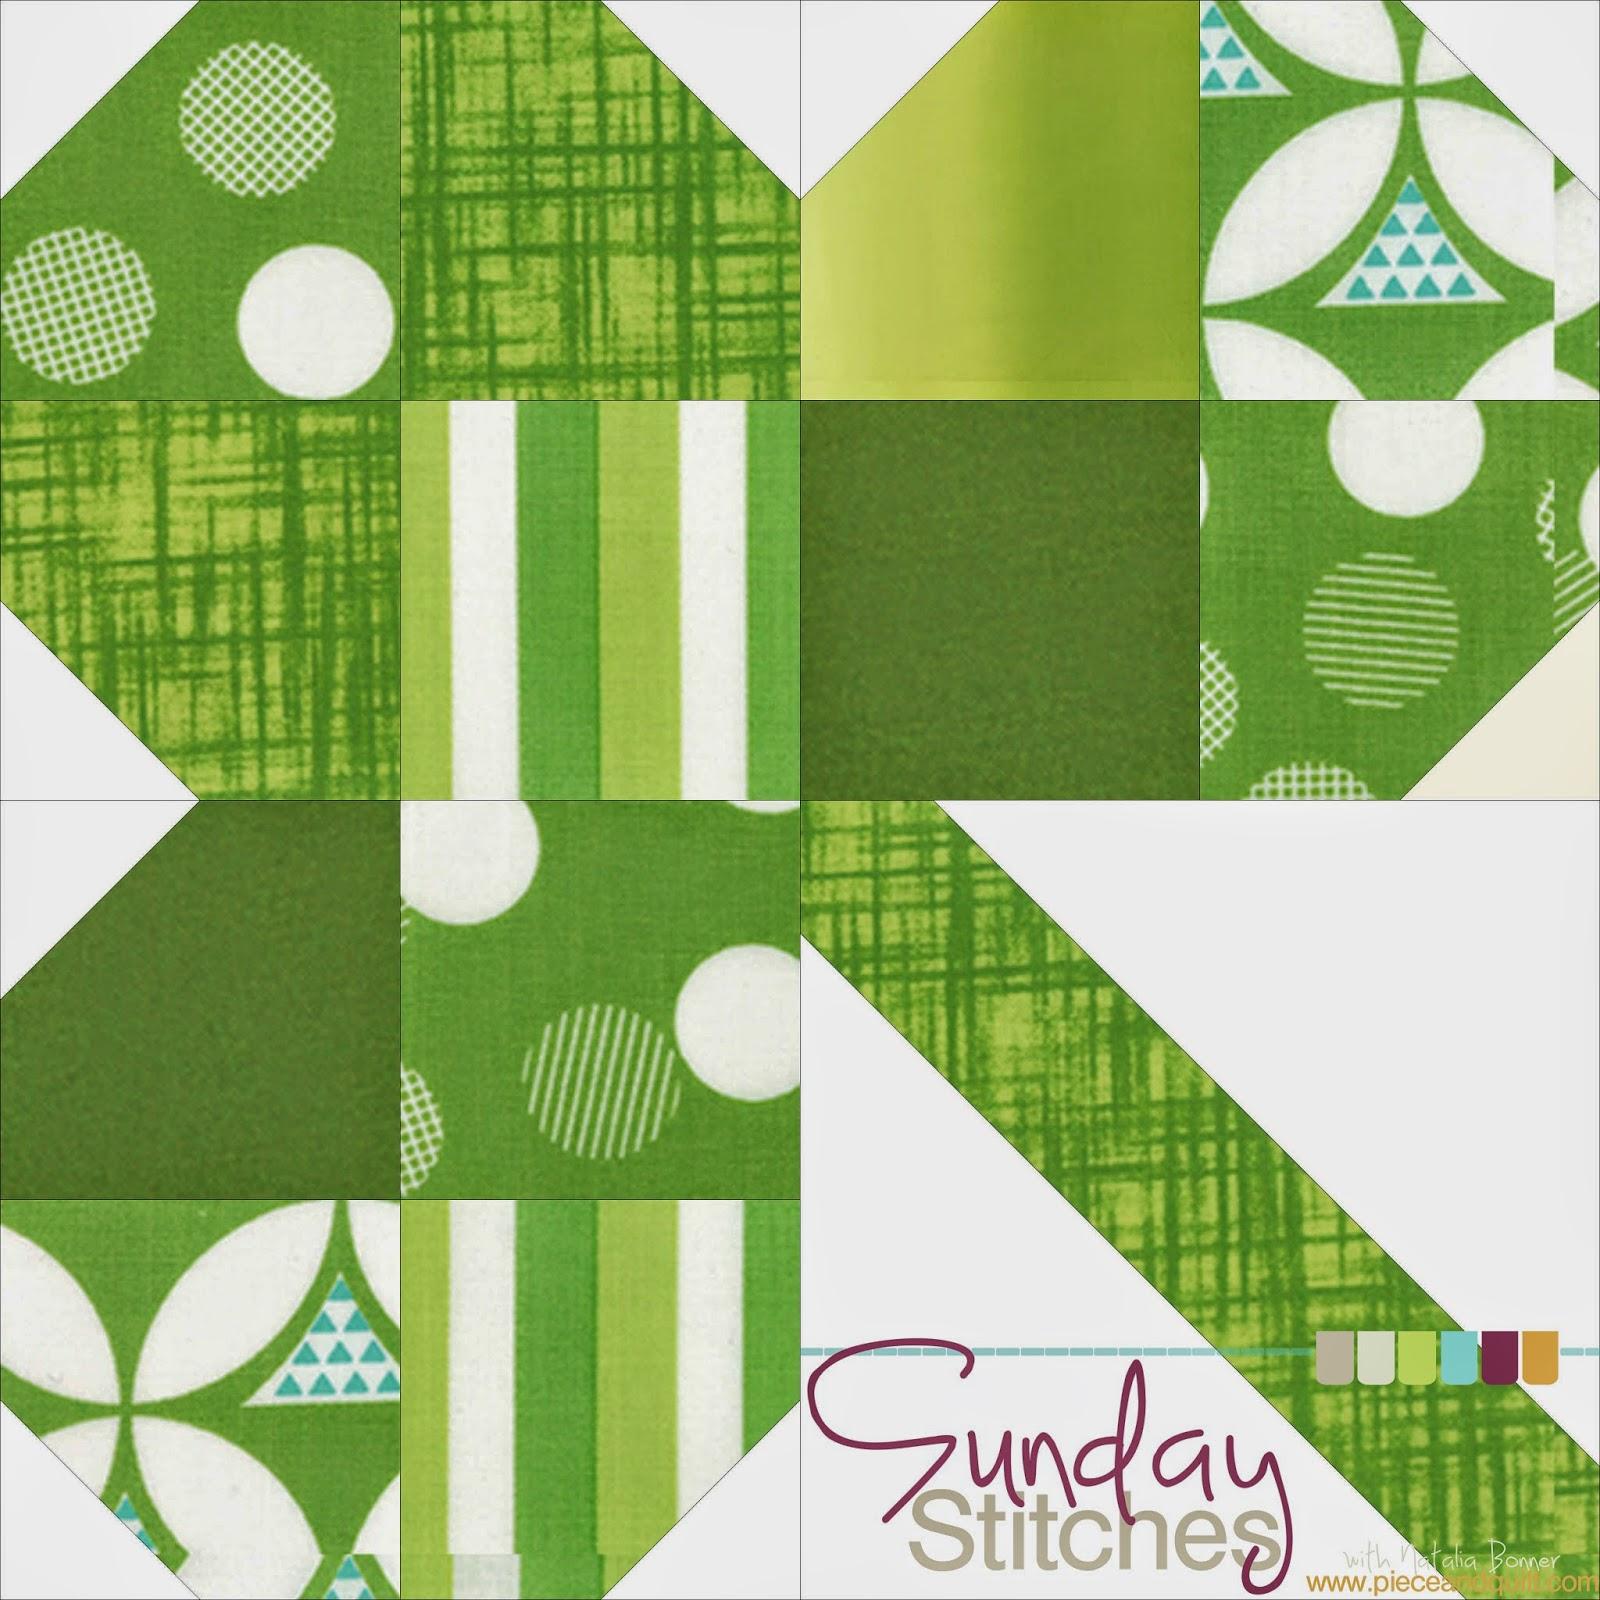 Piece N Quilt: How to: Clover Quilt Block Tutorial - Sunday Stitches : clover quilting - Adamdwight.com